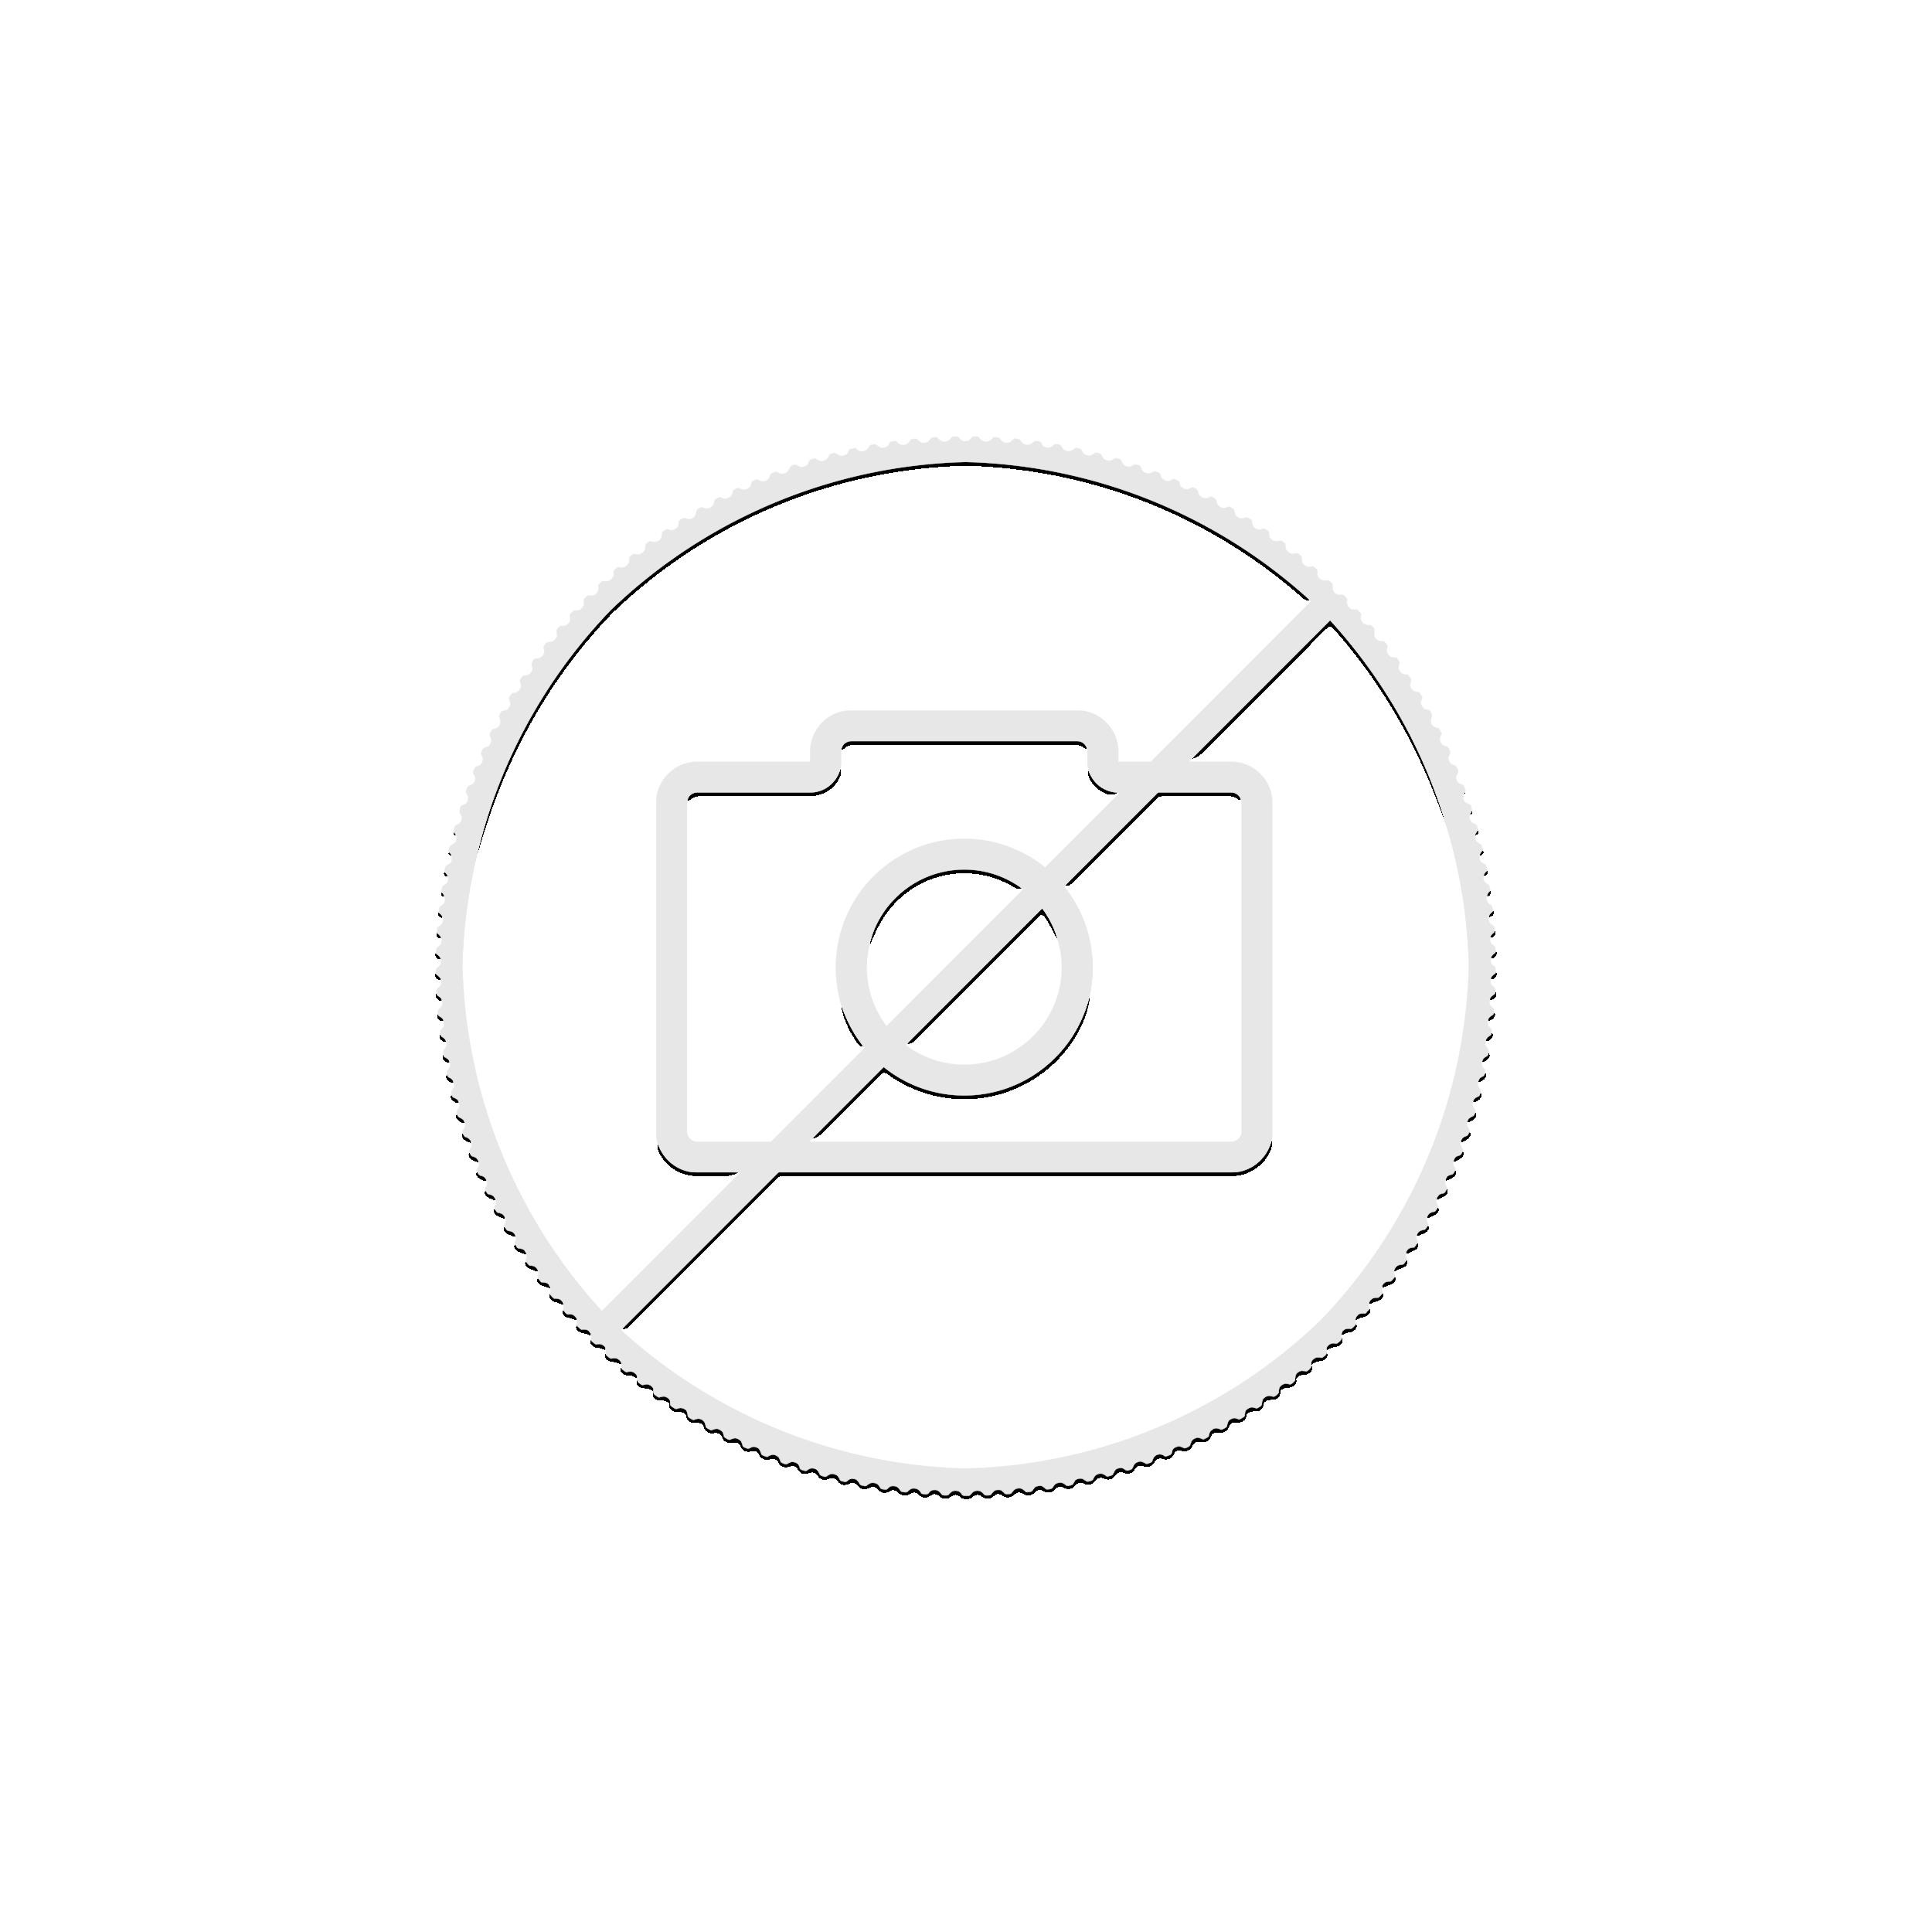 1 Troy ounce zilveren muntbaar Rectangular Dragon 2020 - box